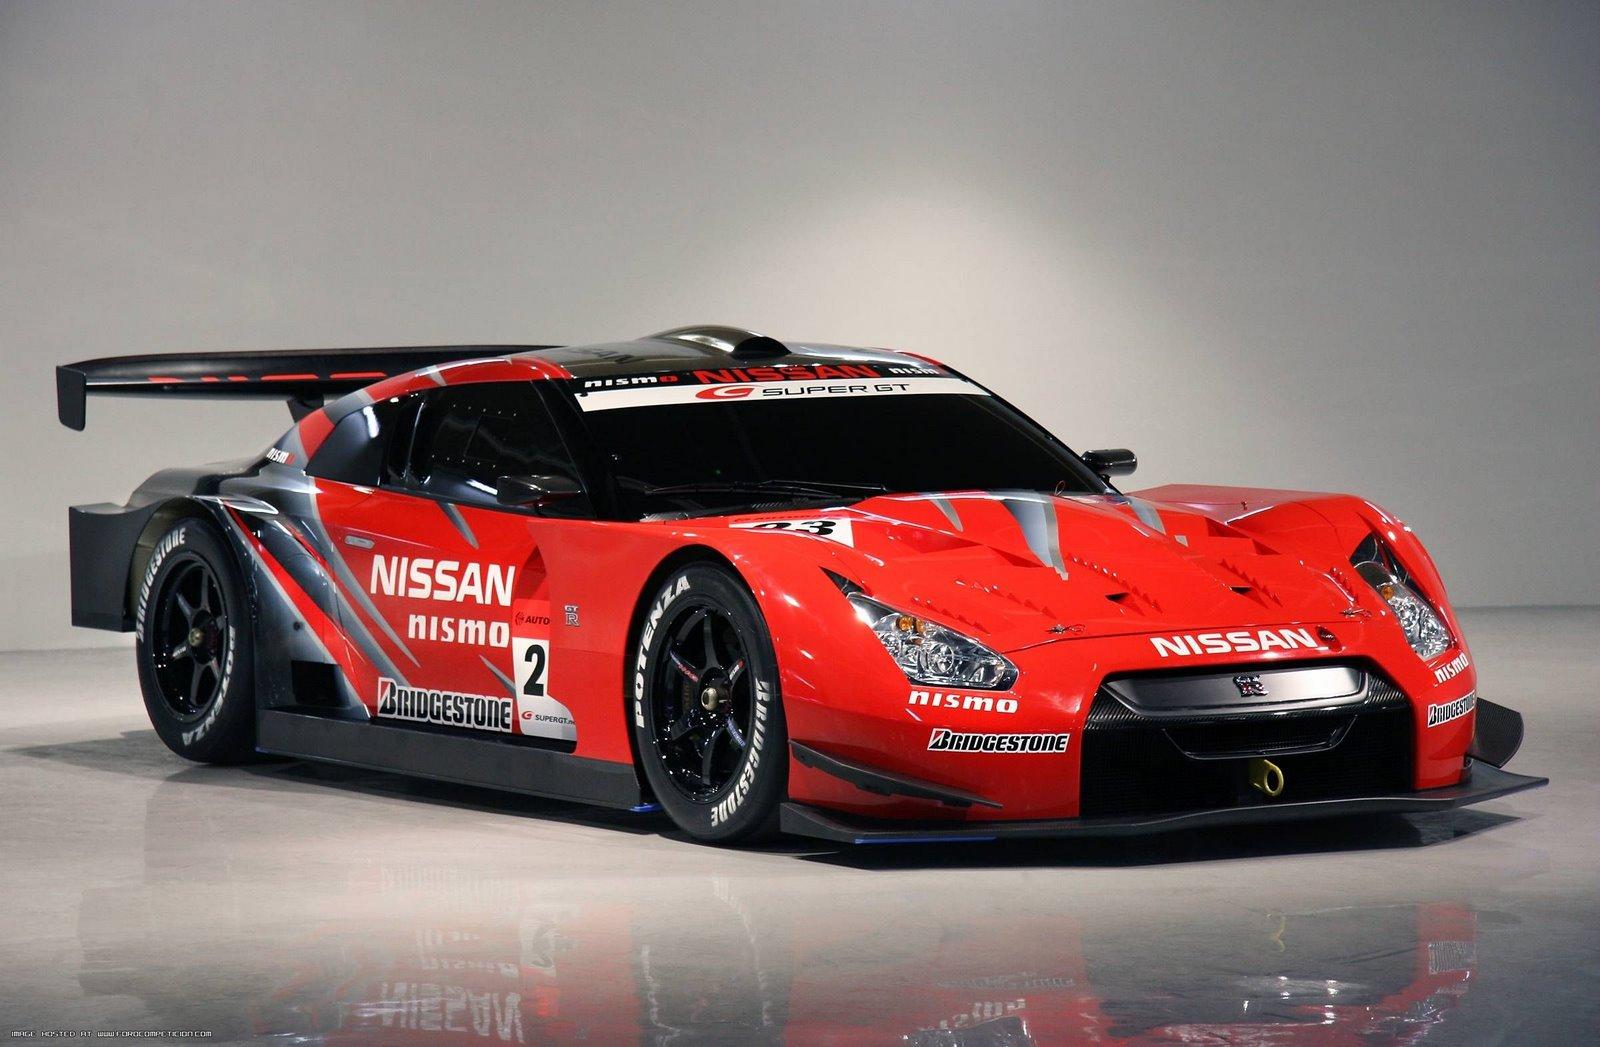 http://1.bp.blogspot.com/-9B_1SRb99m0/TxJyg_qpqjI/AAAAAAAAAB0/xwrPAKyNrHo/s1600/nissan-gt-r-2008-super-gt-gt500-test-car-078.jpg